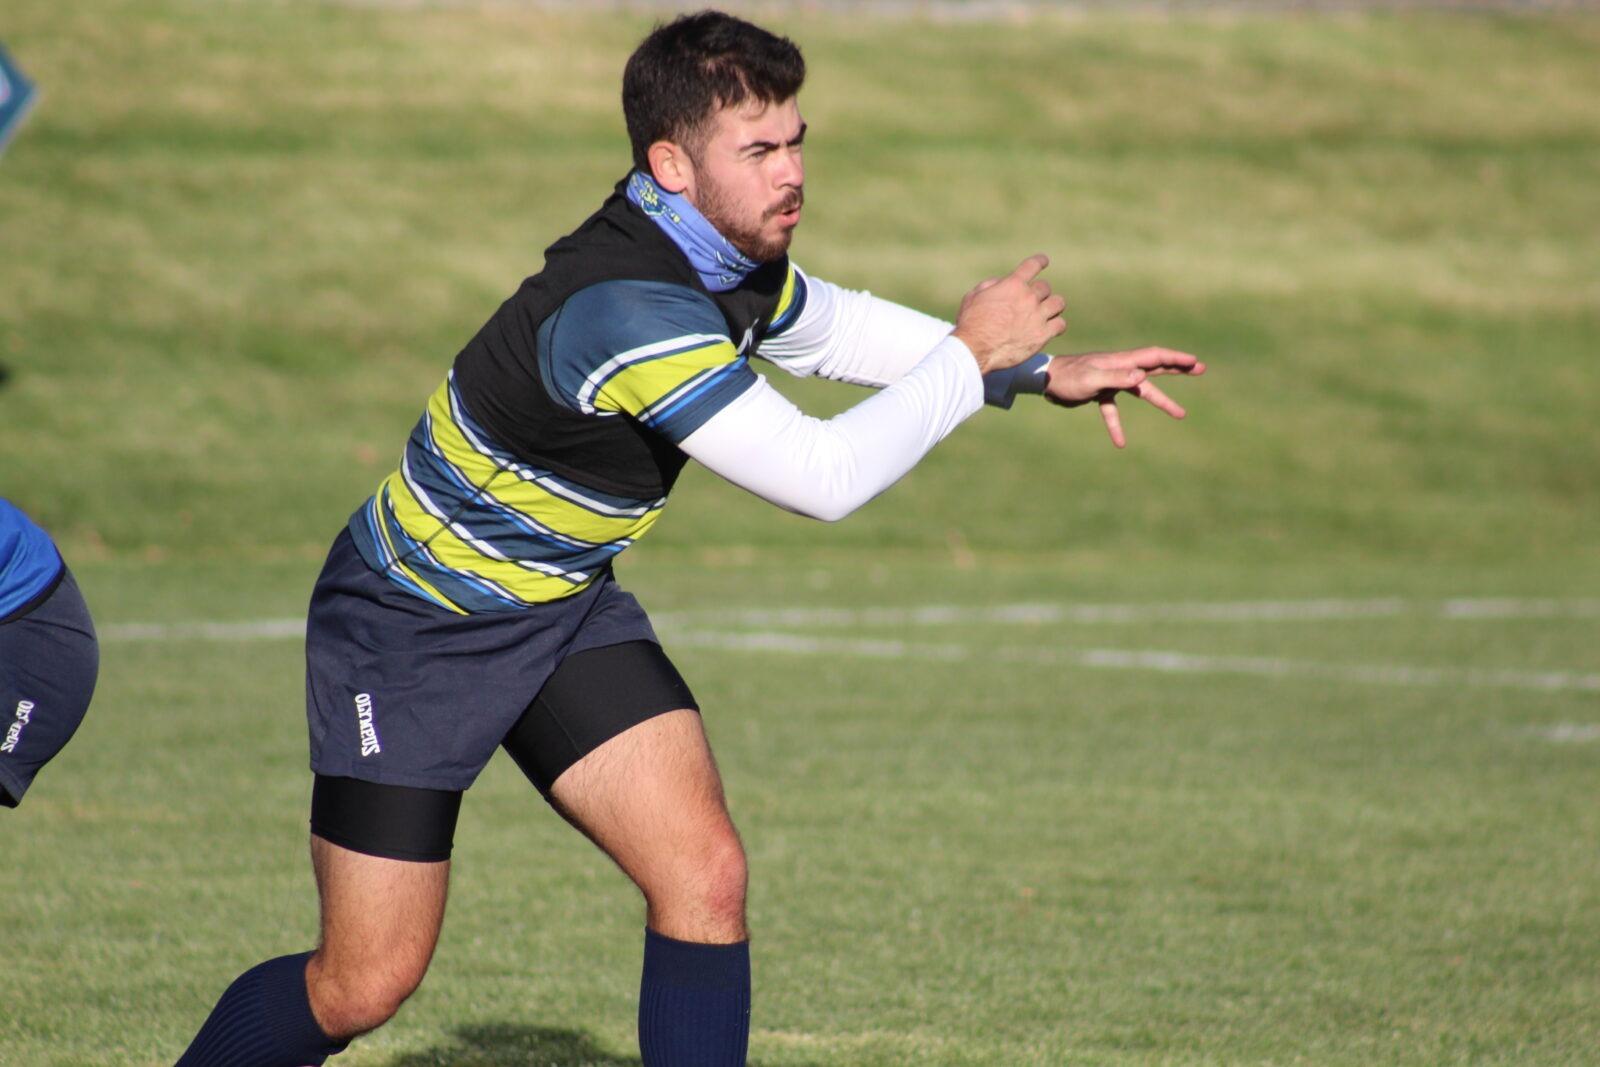 Casey McDermott Vai training to become a rugby player through the Colorado XO crossover program